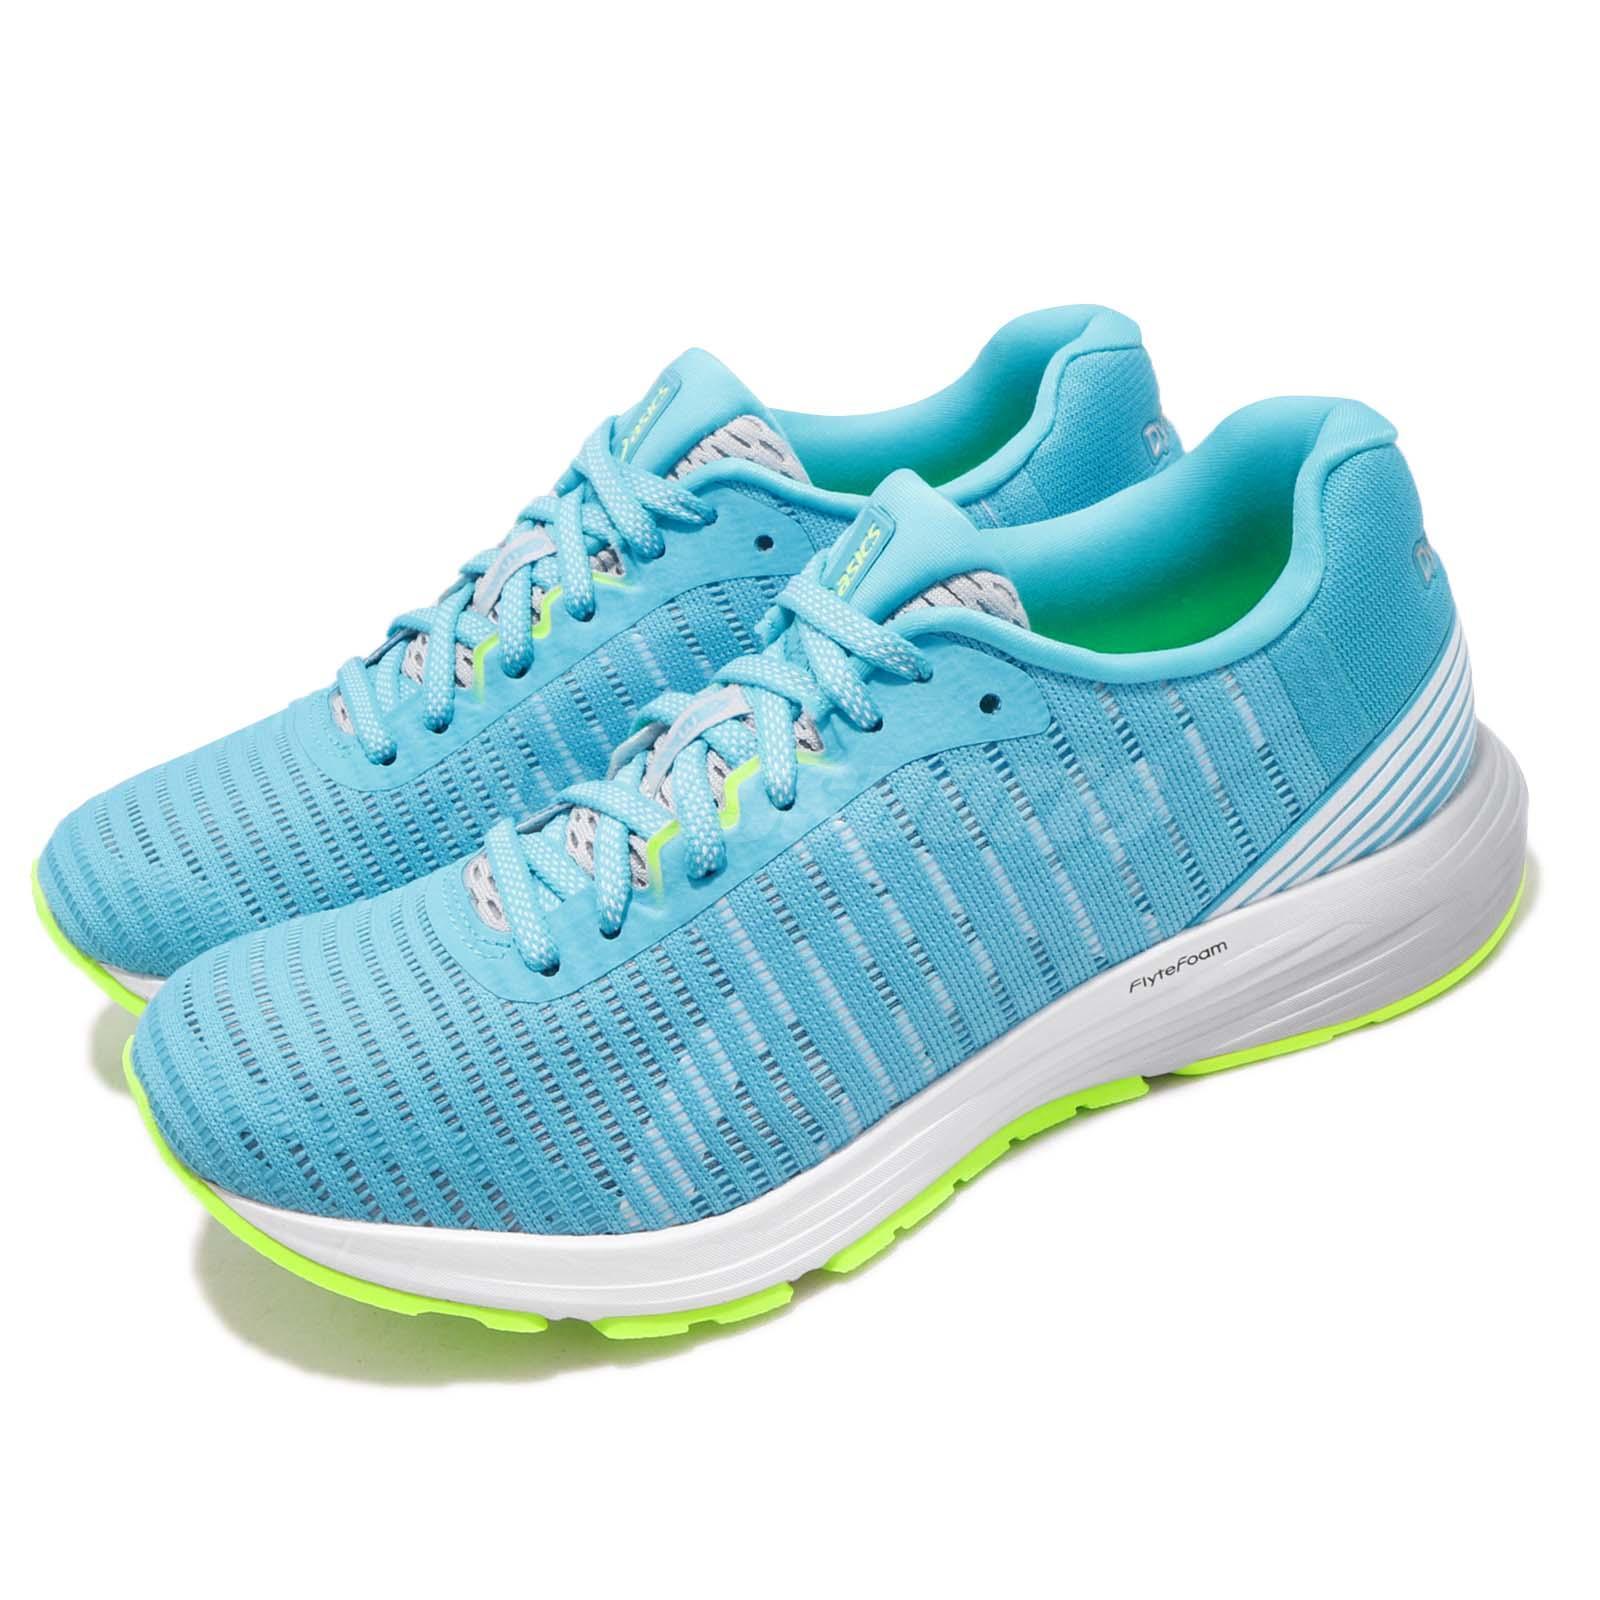 quality design 5efa3 eda51 Details about Asics DynaFlyte 3 III Aqua Arium Blue White Women Running  Shoes 1012A002-400